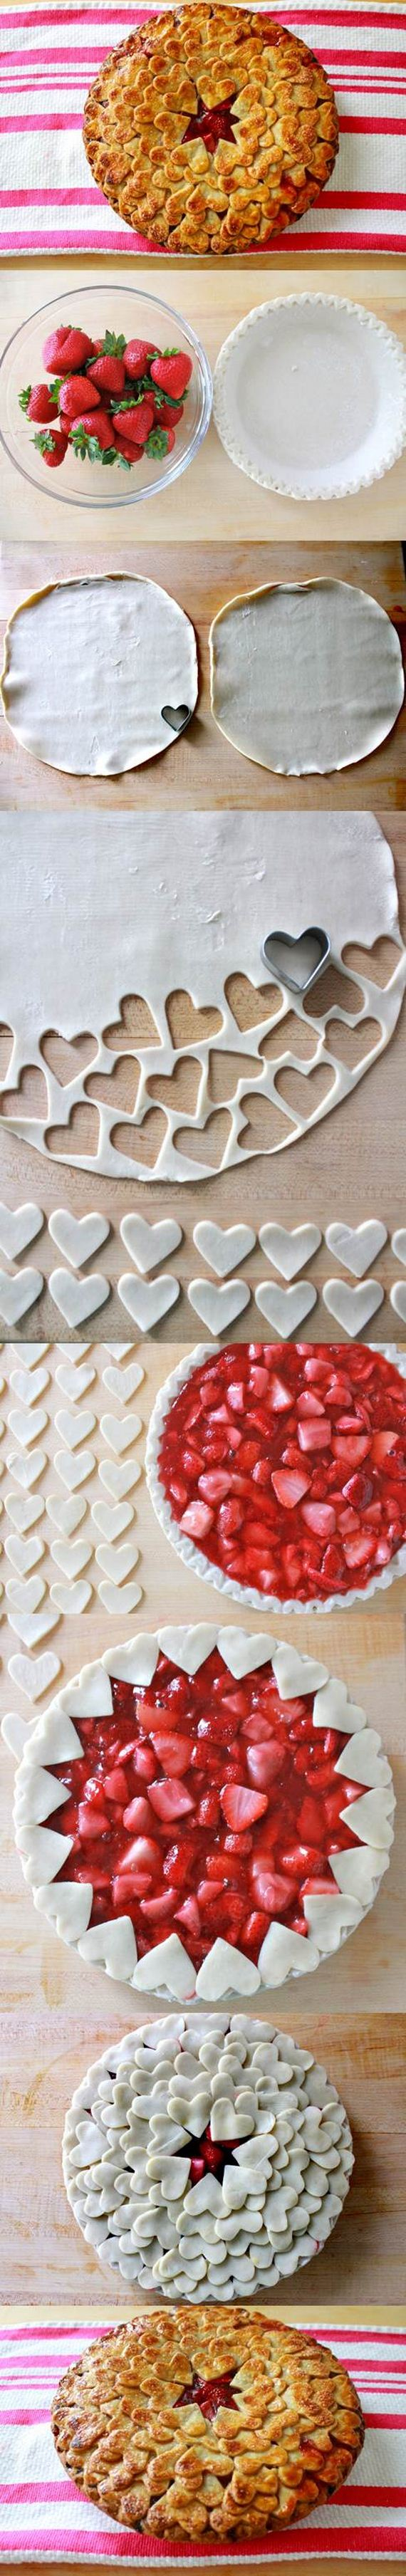 01-These-Romantic-Valentine's-Day